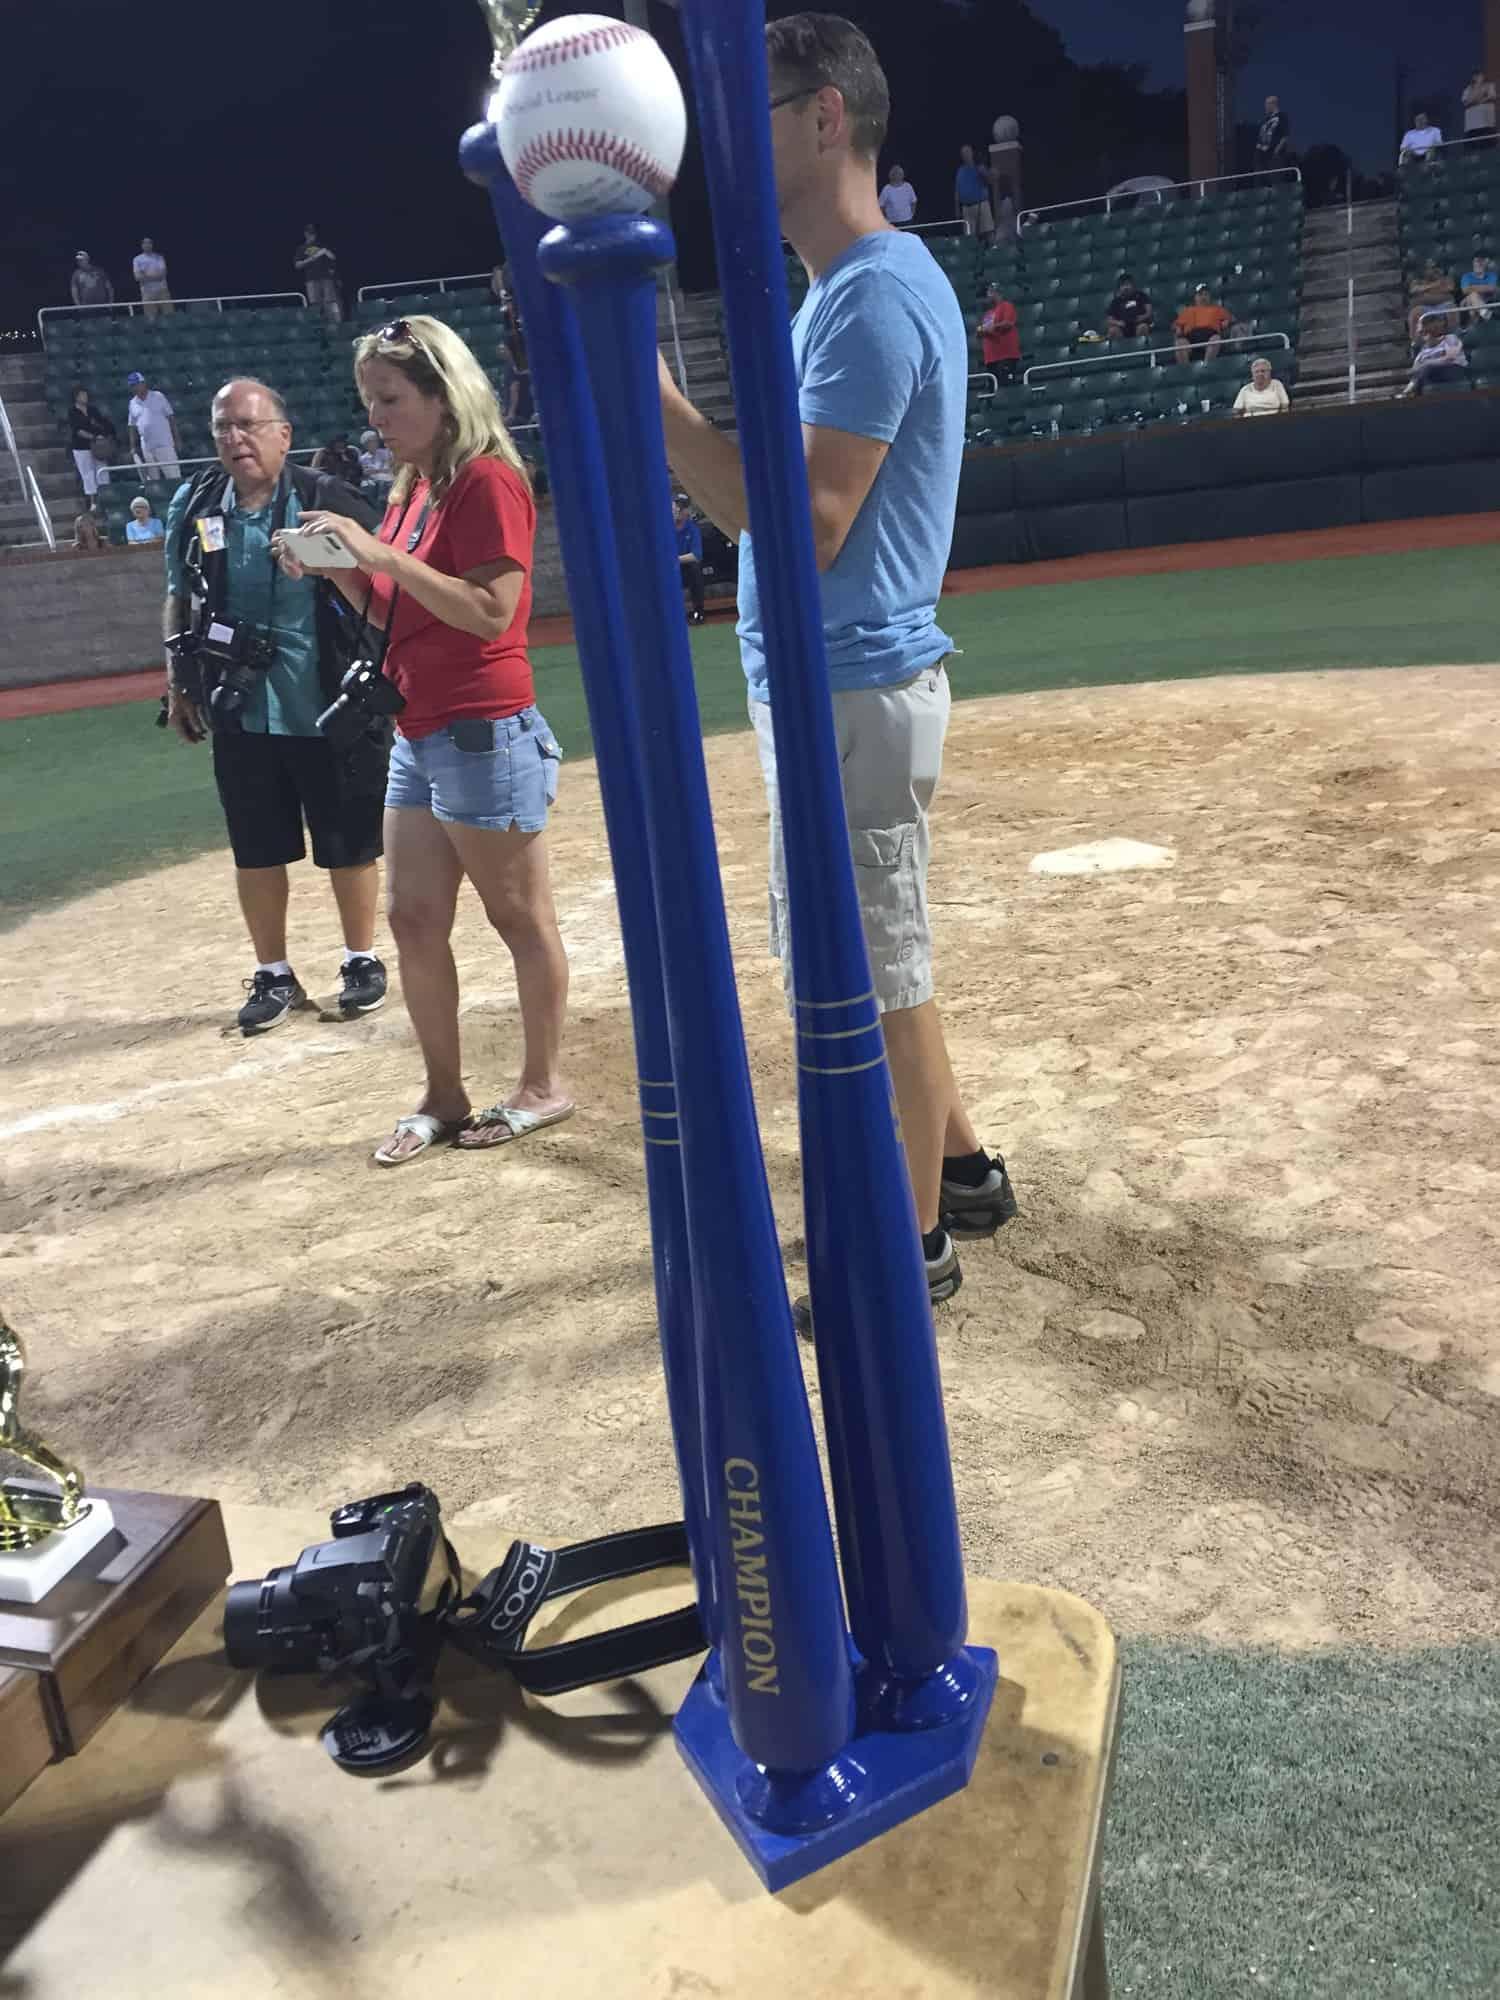 Championship blue bat